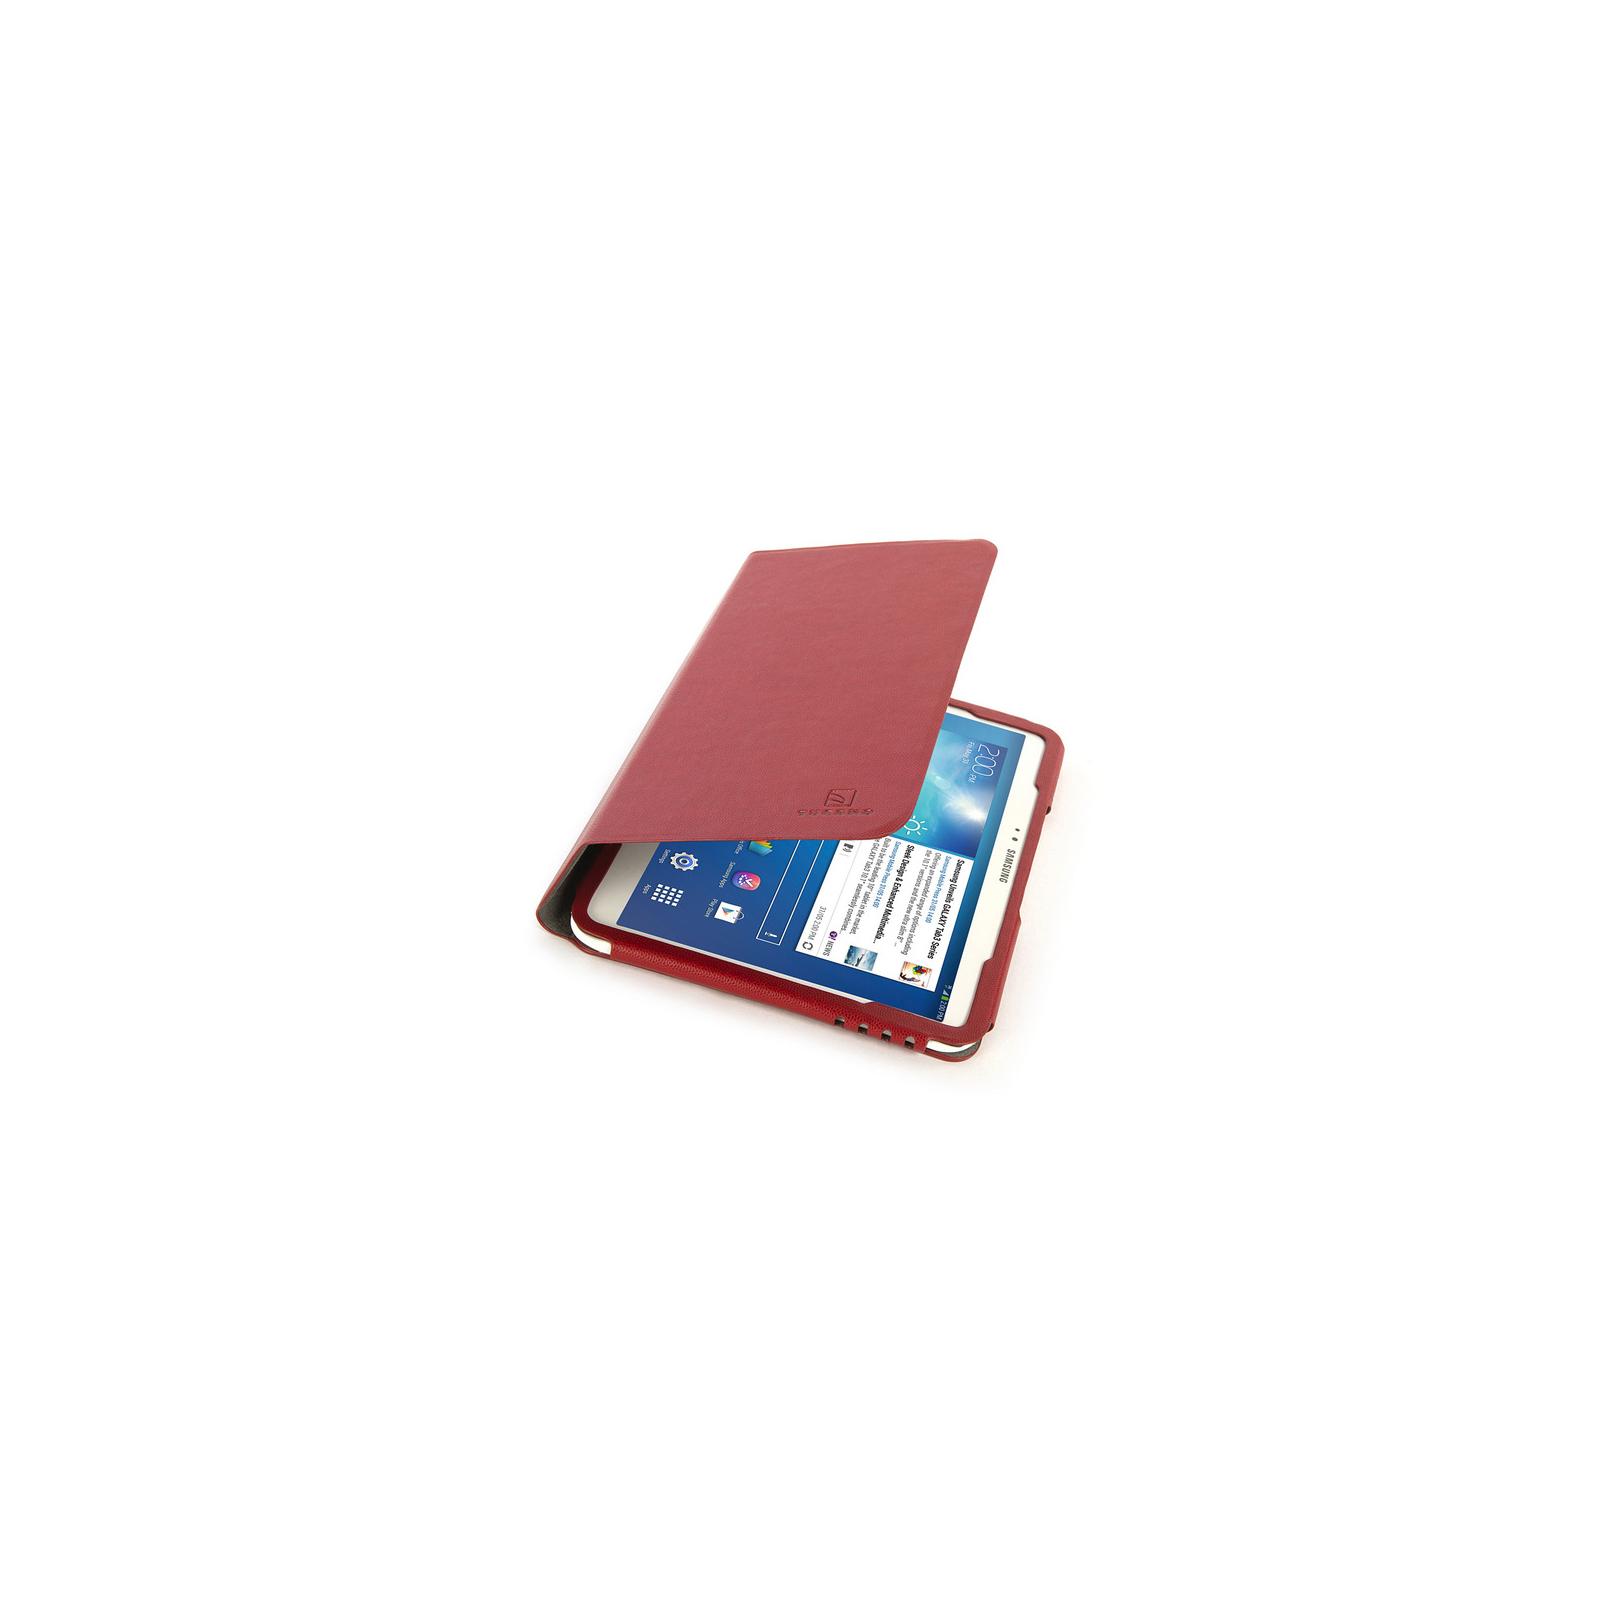 Чехол для планшета Tucano Galaxy Tab 3 10.1 Leggero Red (TAB-LS310-R) изображение 5